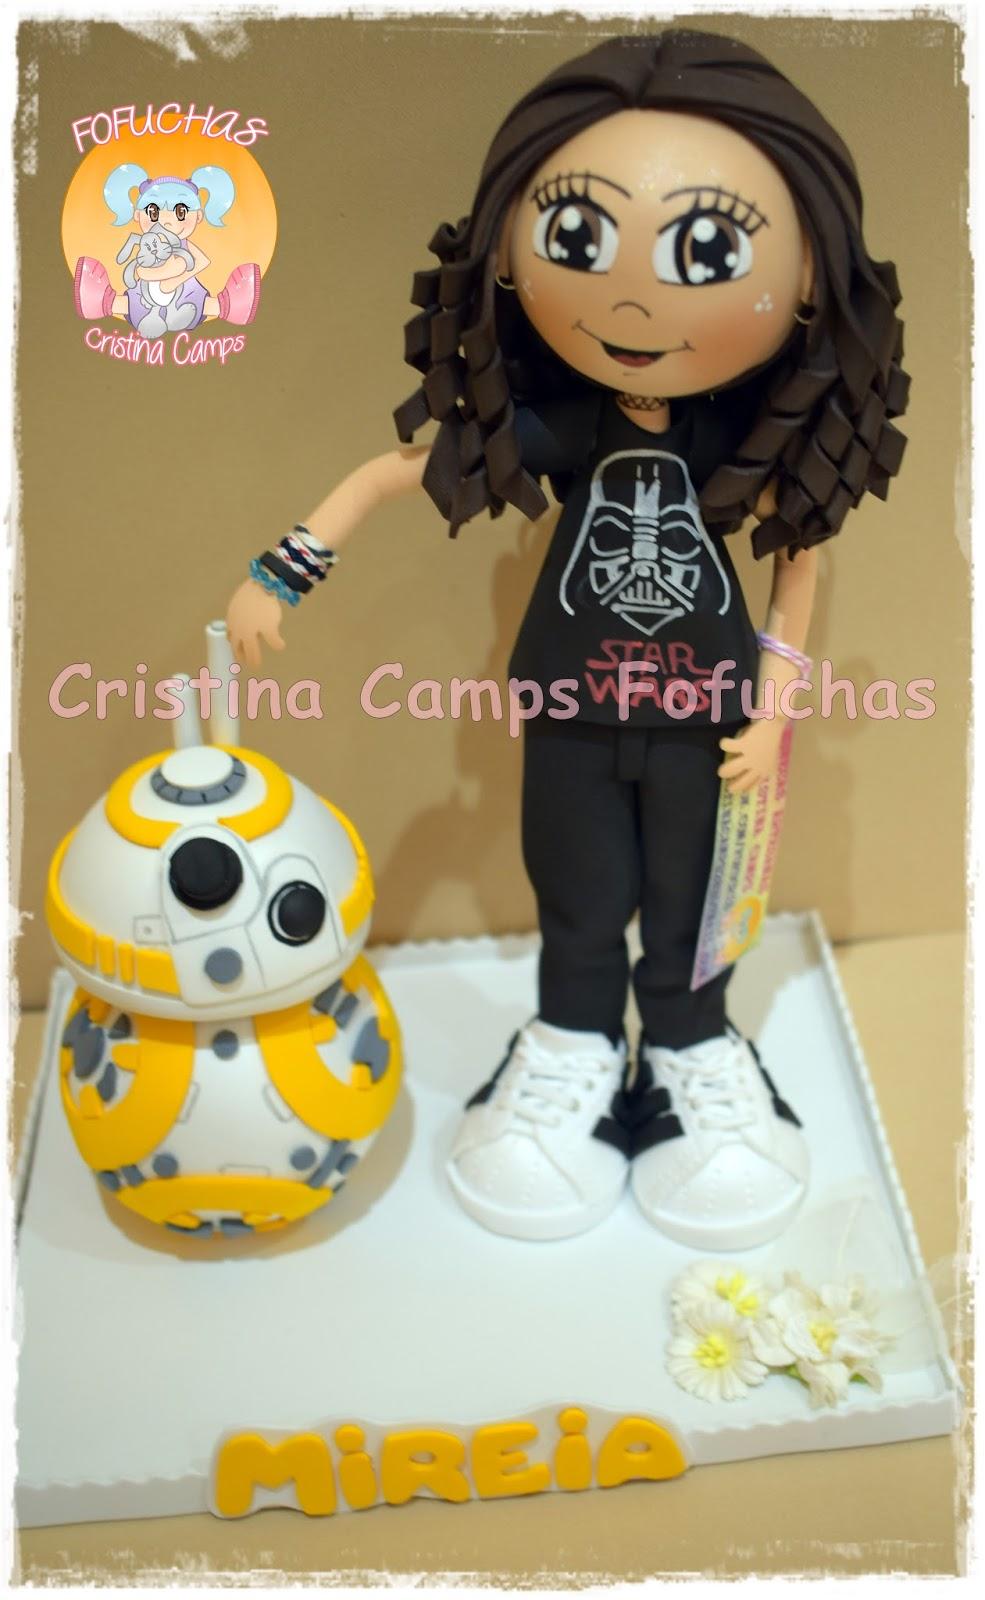 f53a89db224 Cristina Camps Fofuchas  FOFUCHA STAR WARS